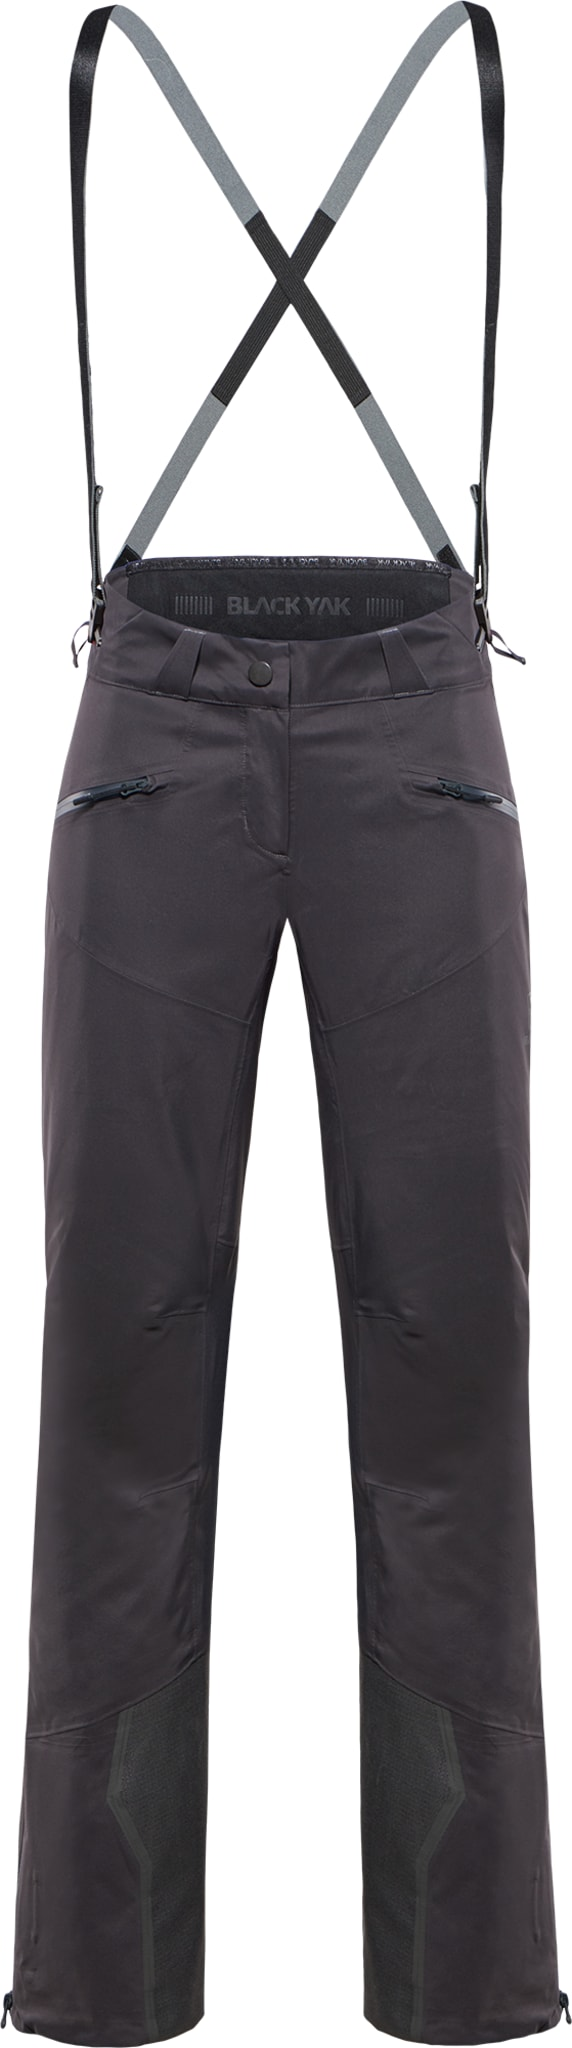 Amrit Pants Ws